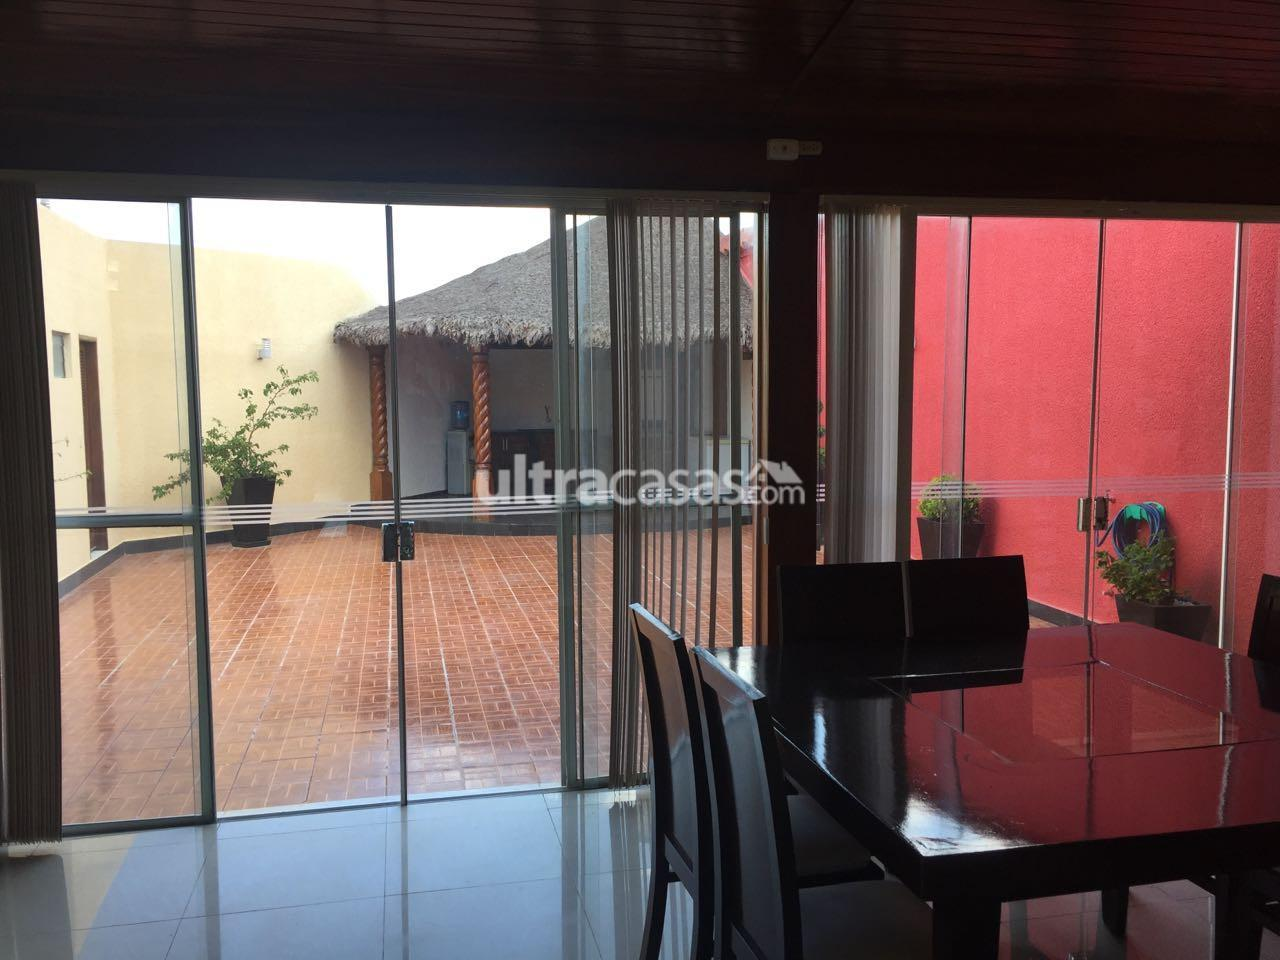 Casa en Venta Av. Banzer km, 10, condominio Sevilla Las Terazas I, calle San Pedro Oeste 24. Foto 10